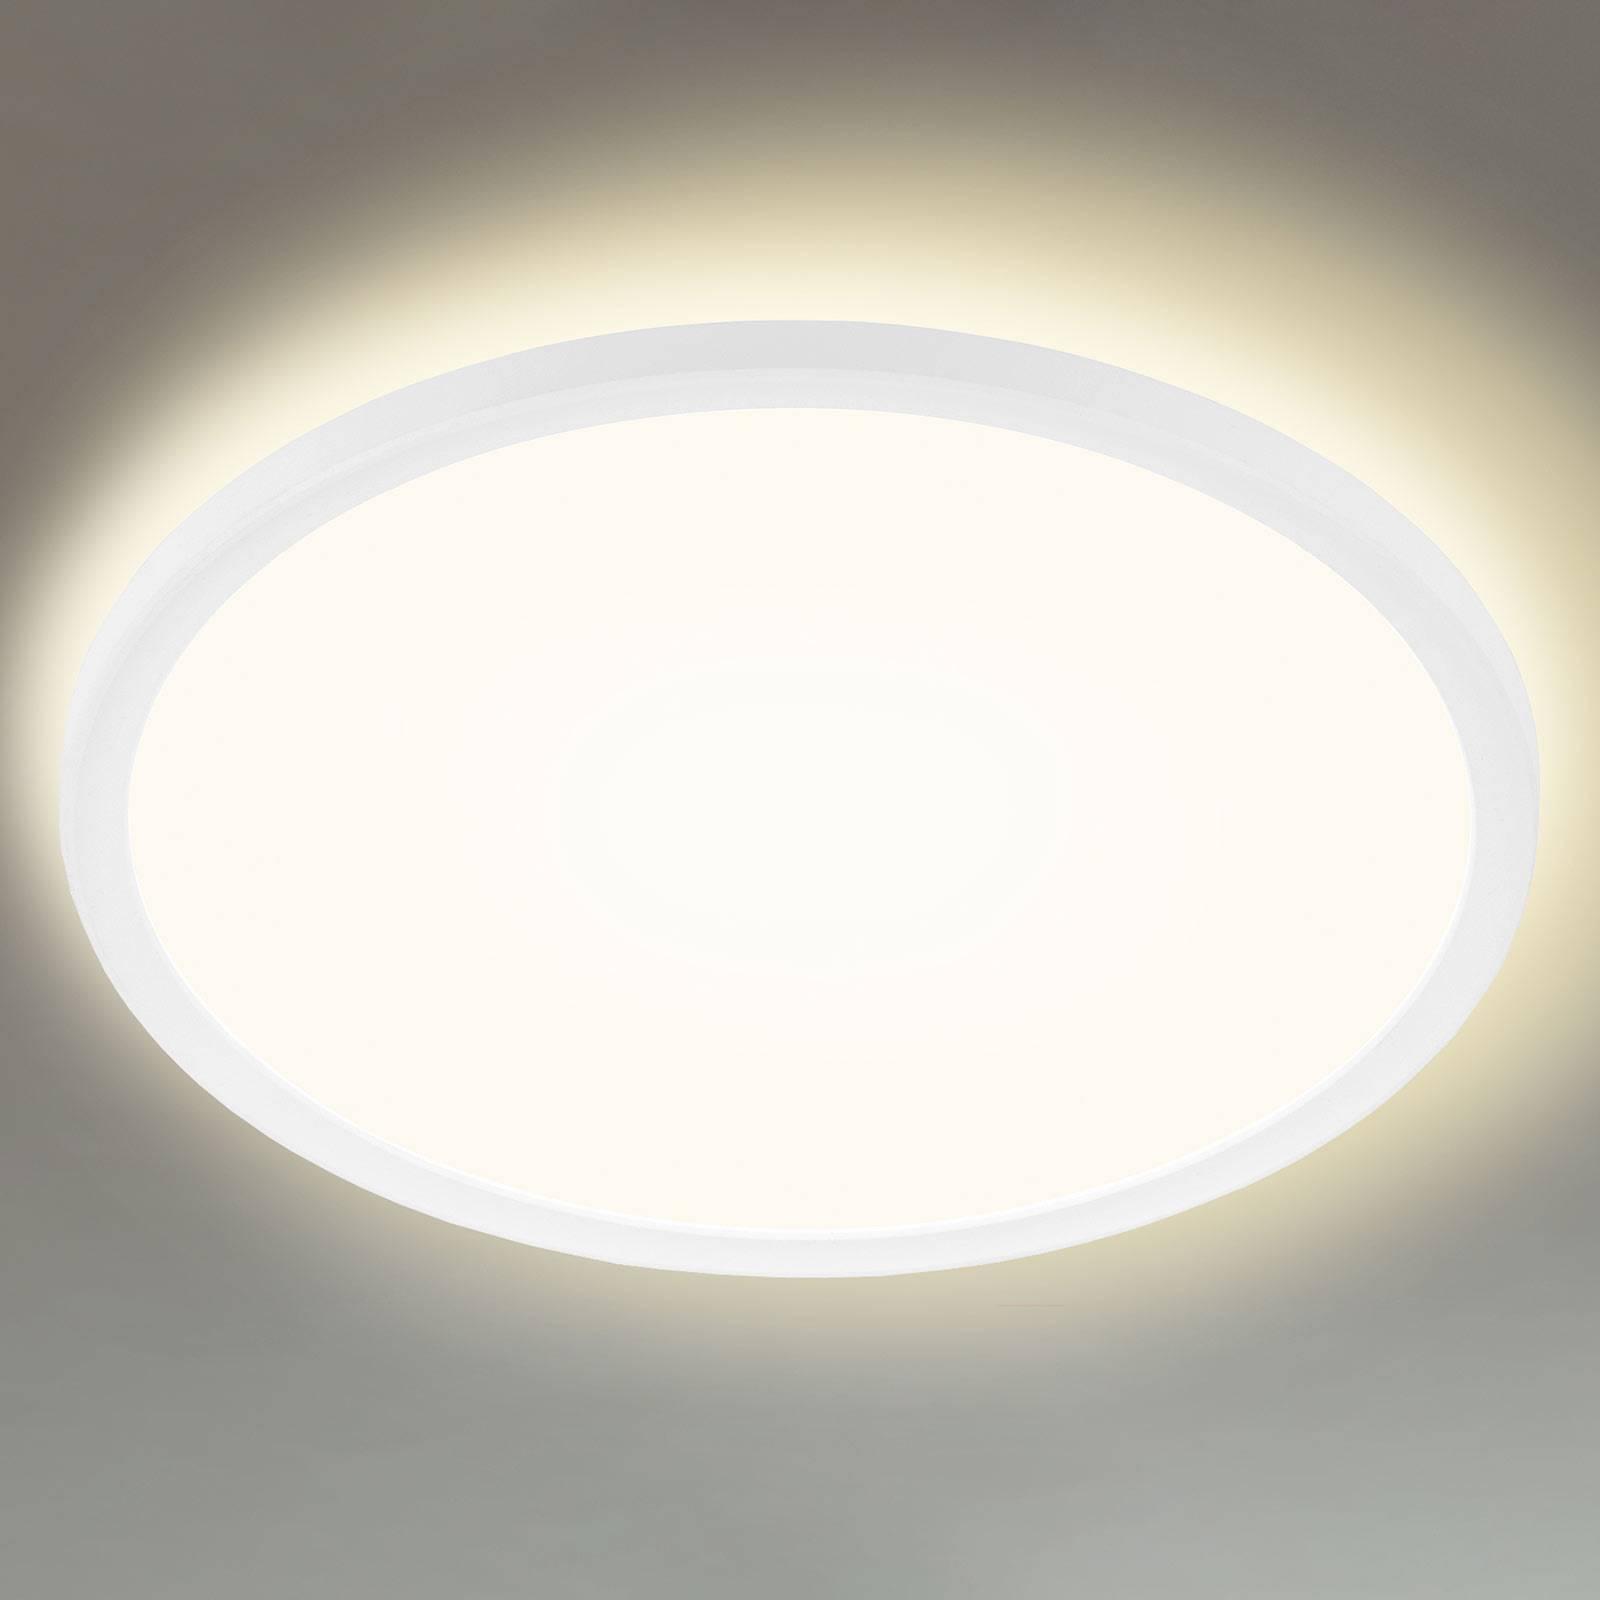 Lampa sufitowa LED 7155/7157, okrągła, 42cm